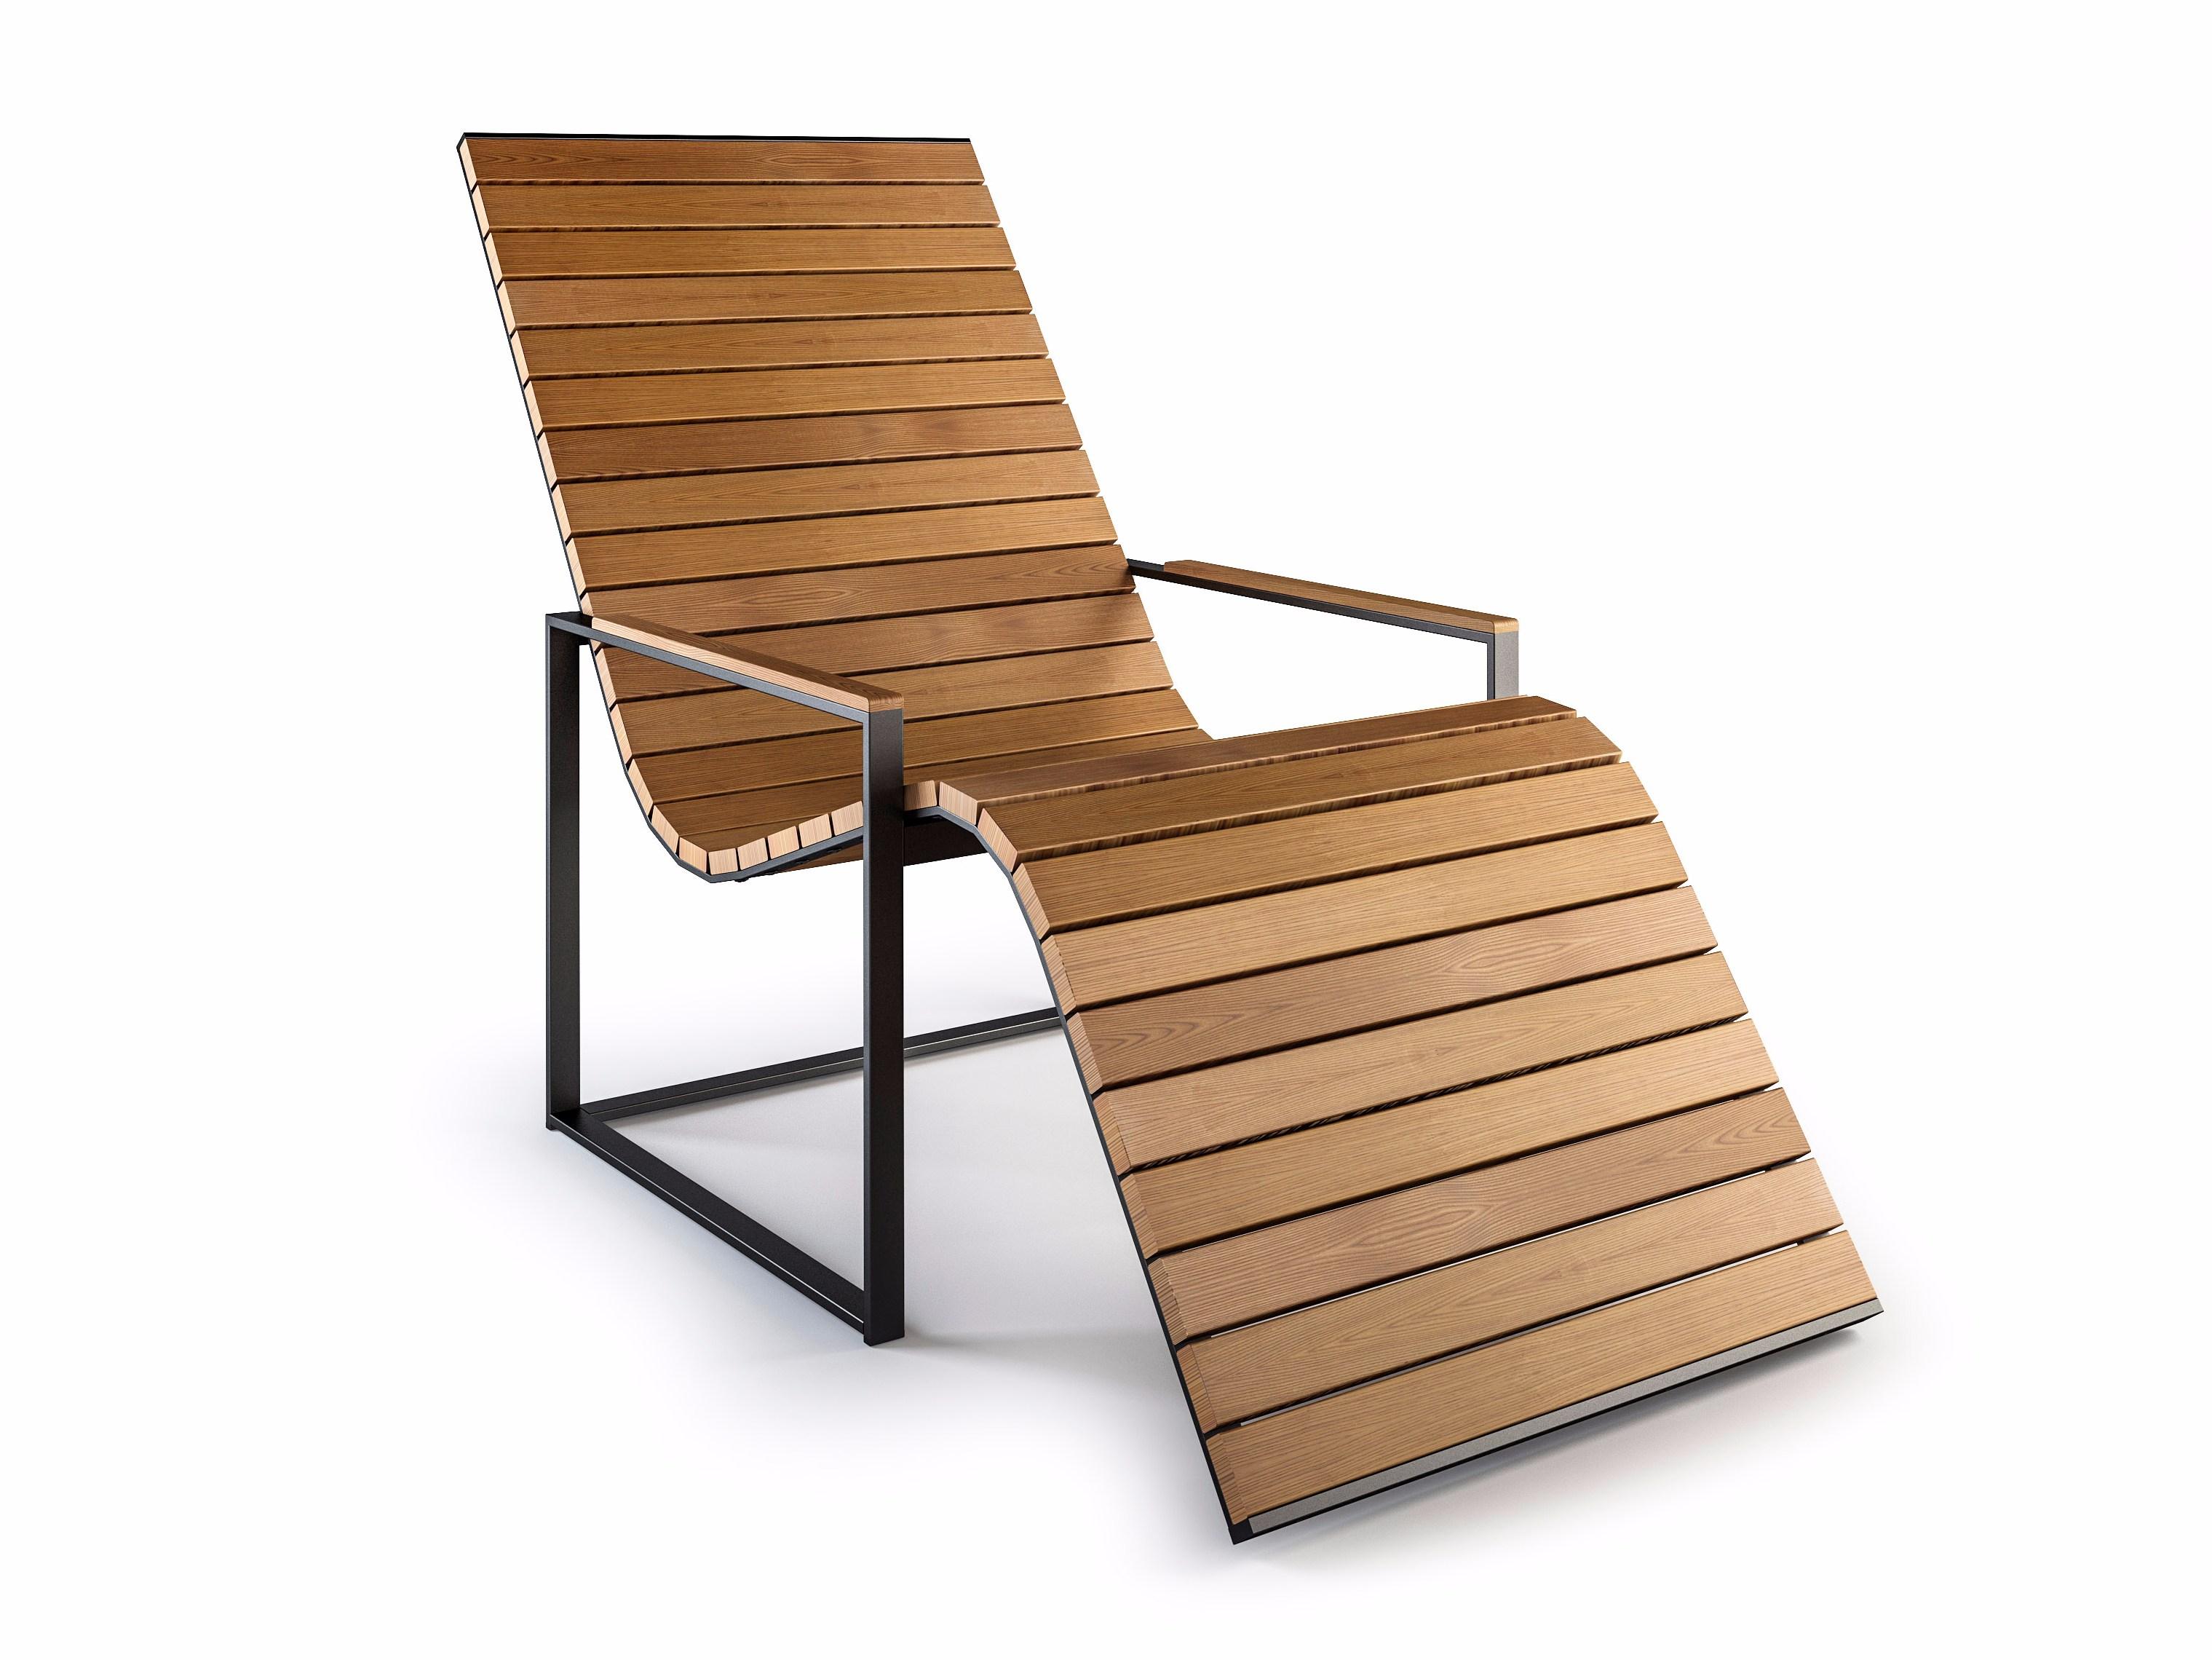 wooden deck chair with armrests garden sun chair by röshults design brda - NQOQDTQ